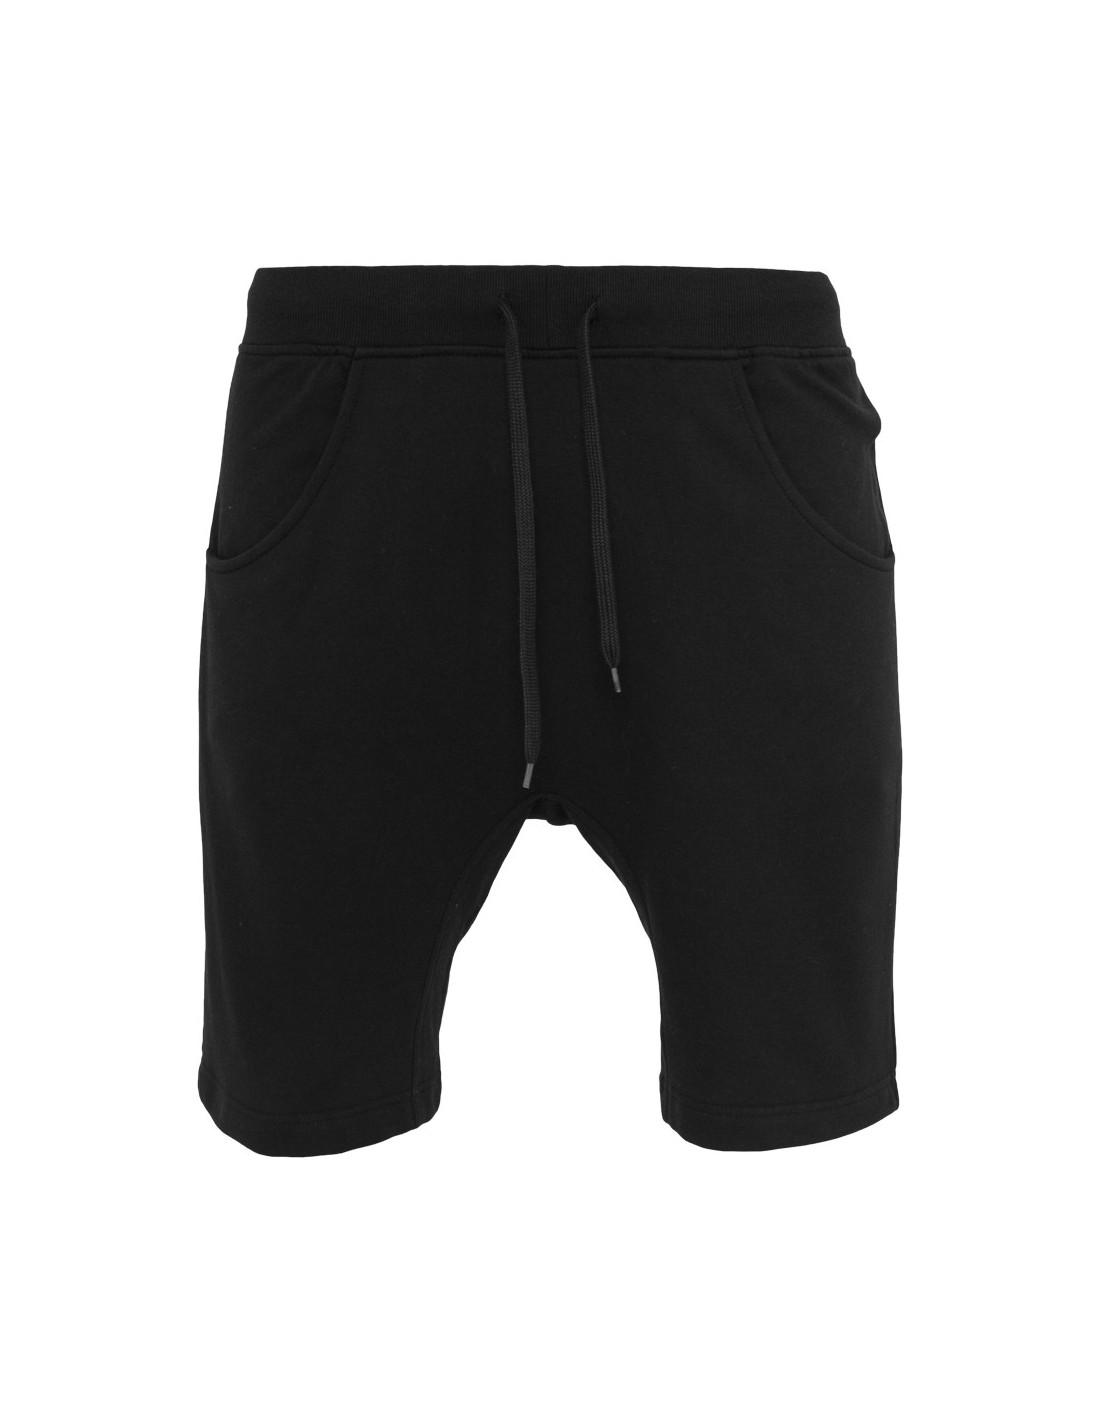 Urban Drop Crotch Sweat Shorts Black